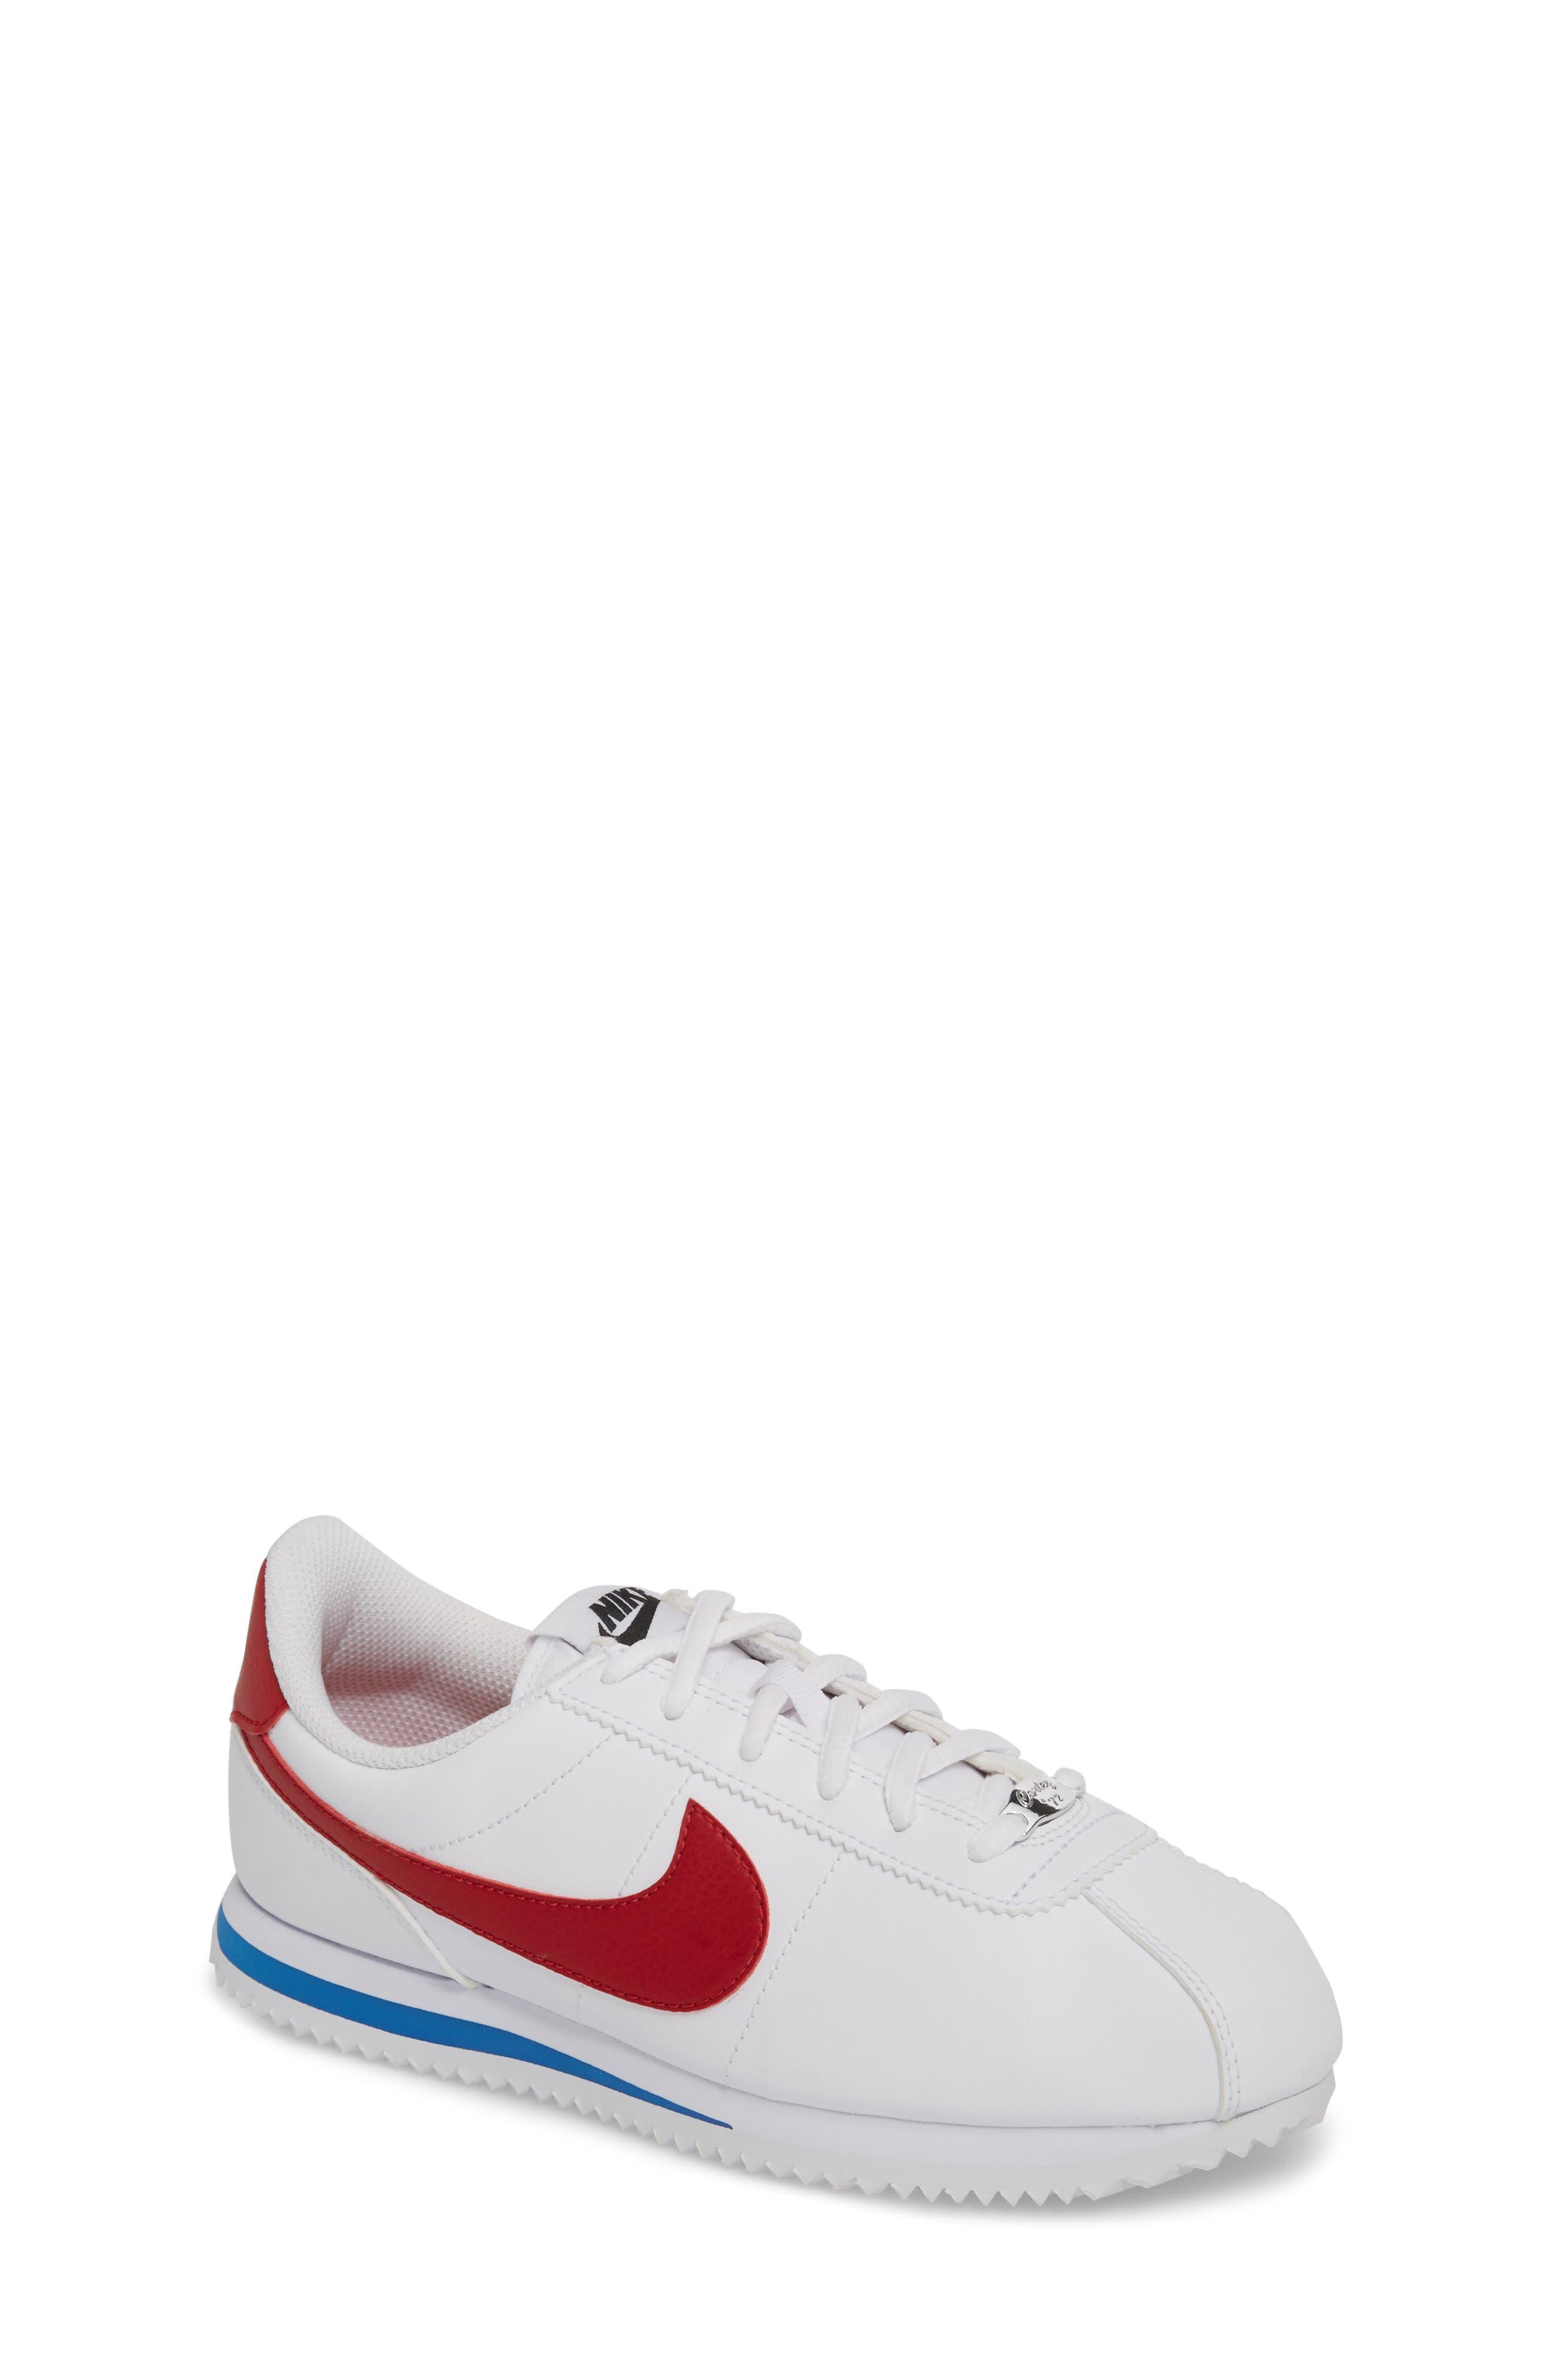 Cortez Basic SL Sneaker,                             Main thumbnail 1, color,                             WHITE/ VARSITY RED-ROYAL-BLACK